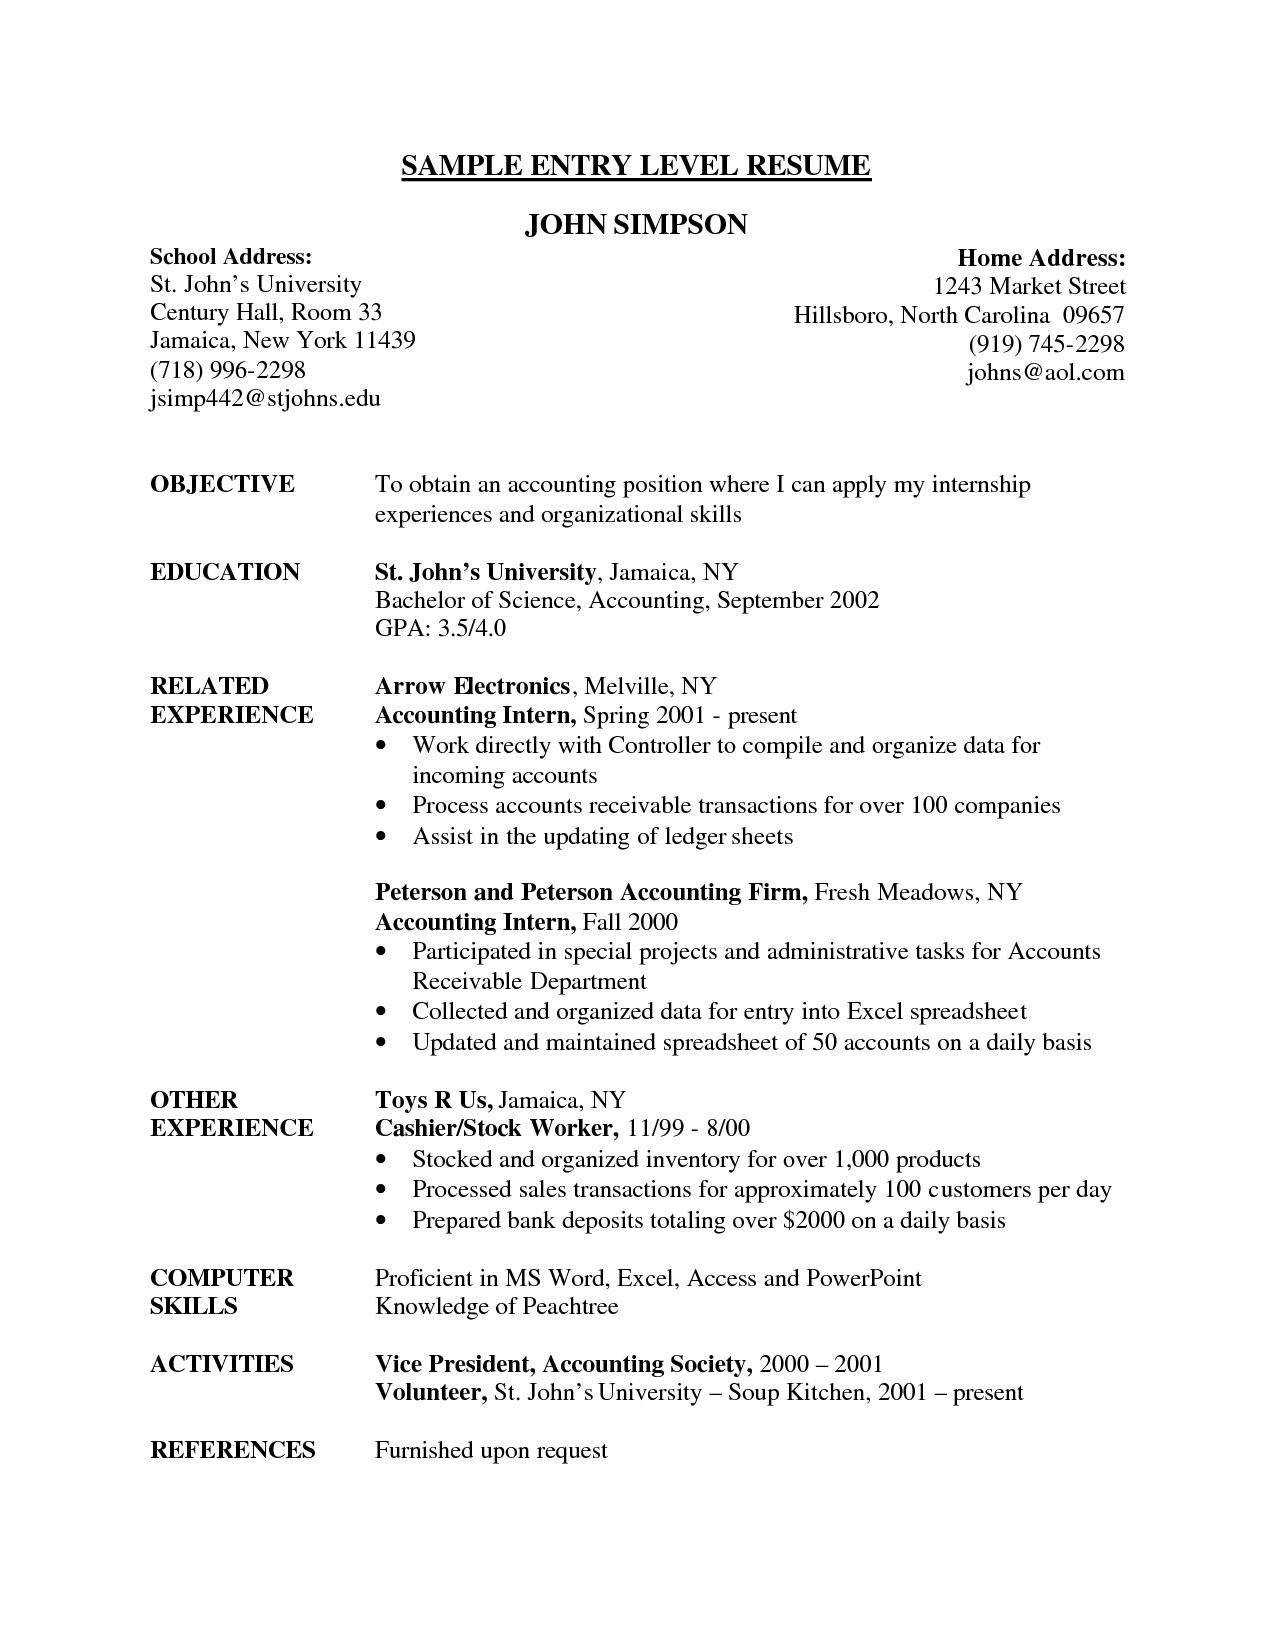 EntryLevel Marketing Resume Samples SAMPLE ENTRY LEVEL